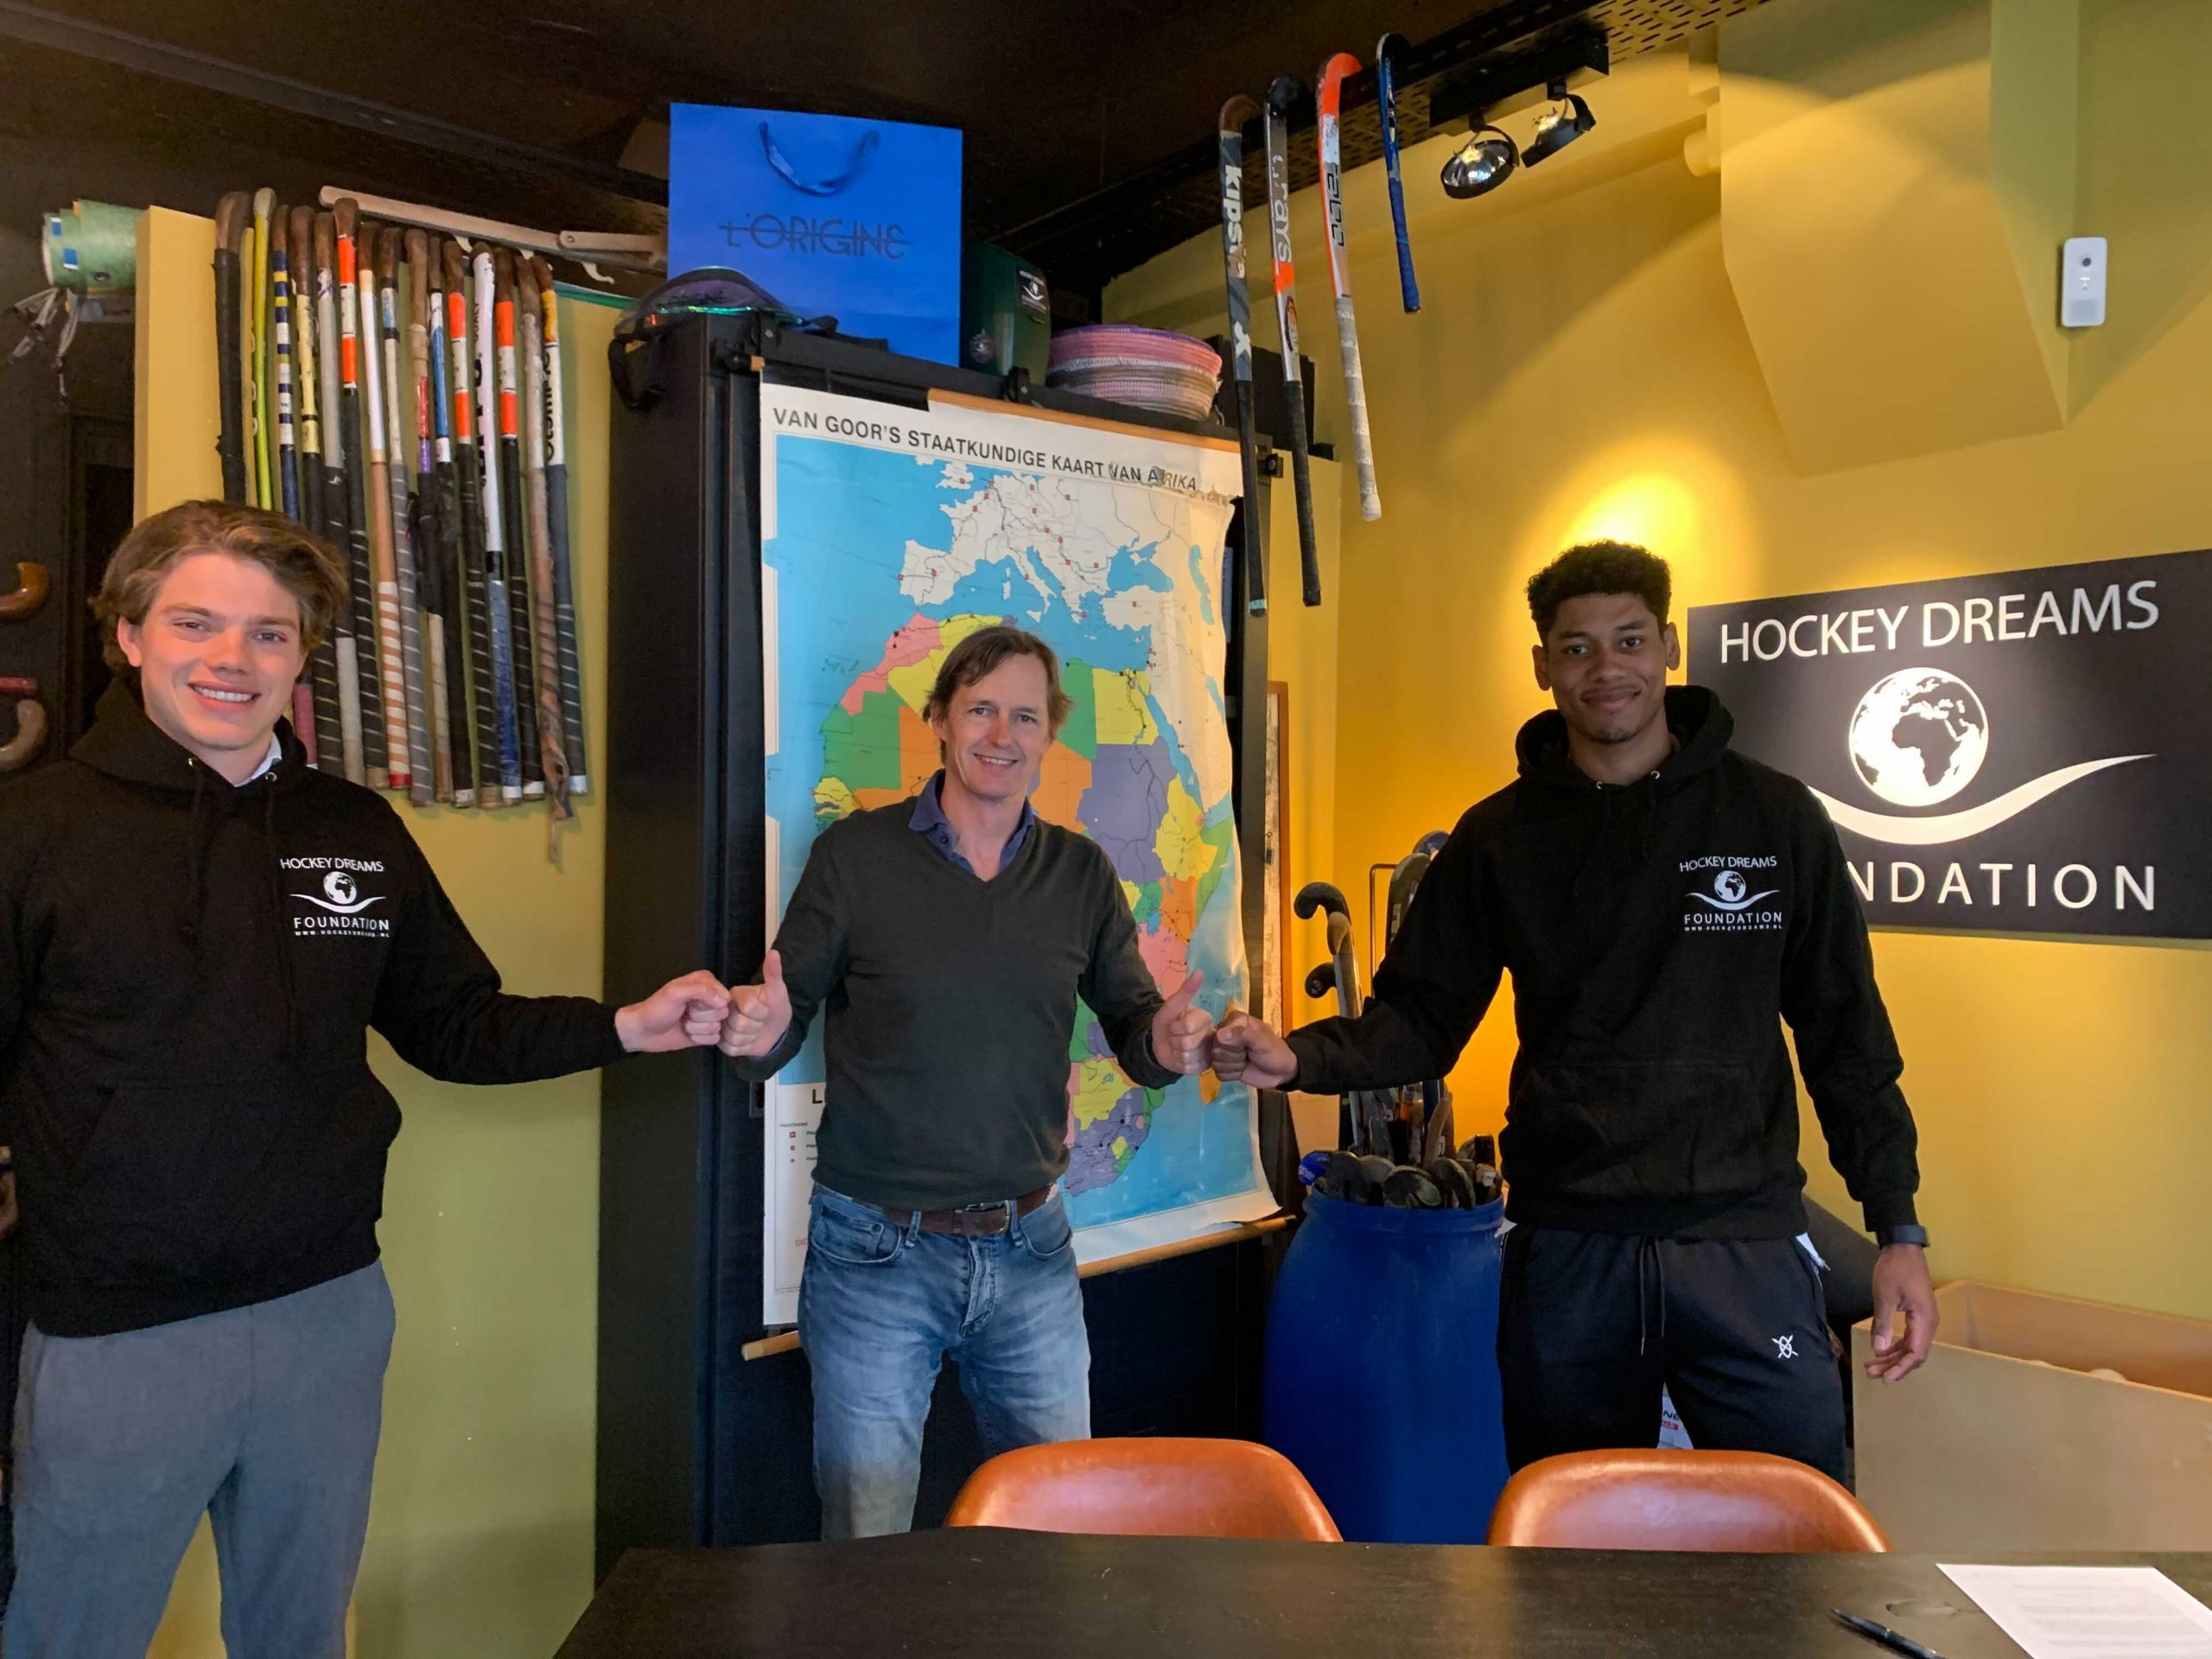 Terrance Pieters and Derck de Vilder join Hockey Dreams Foundation as Ambassadors